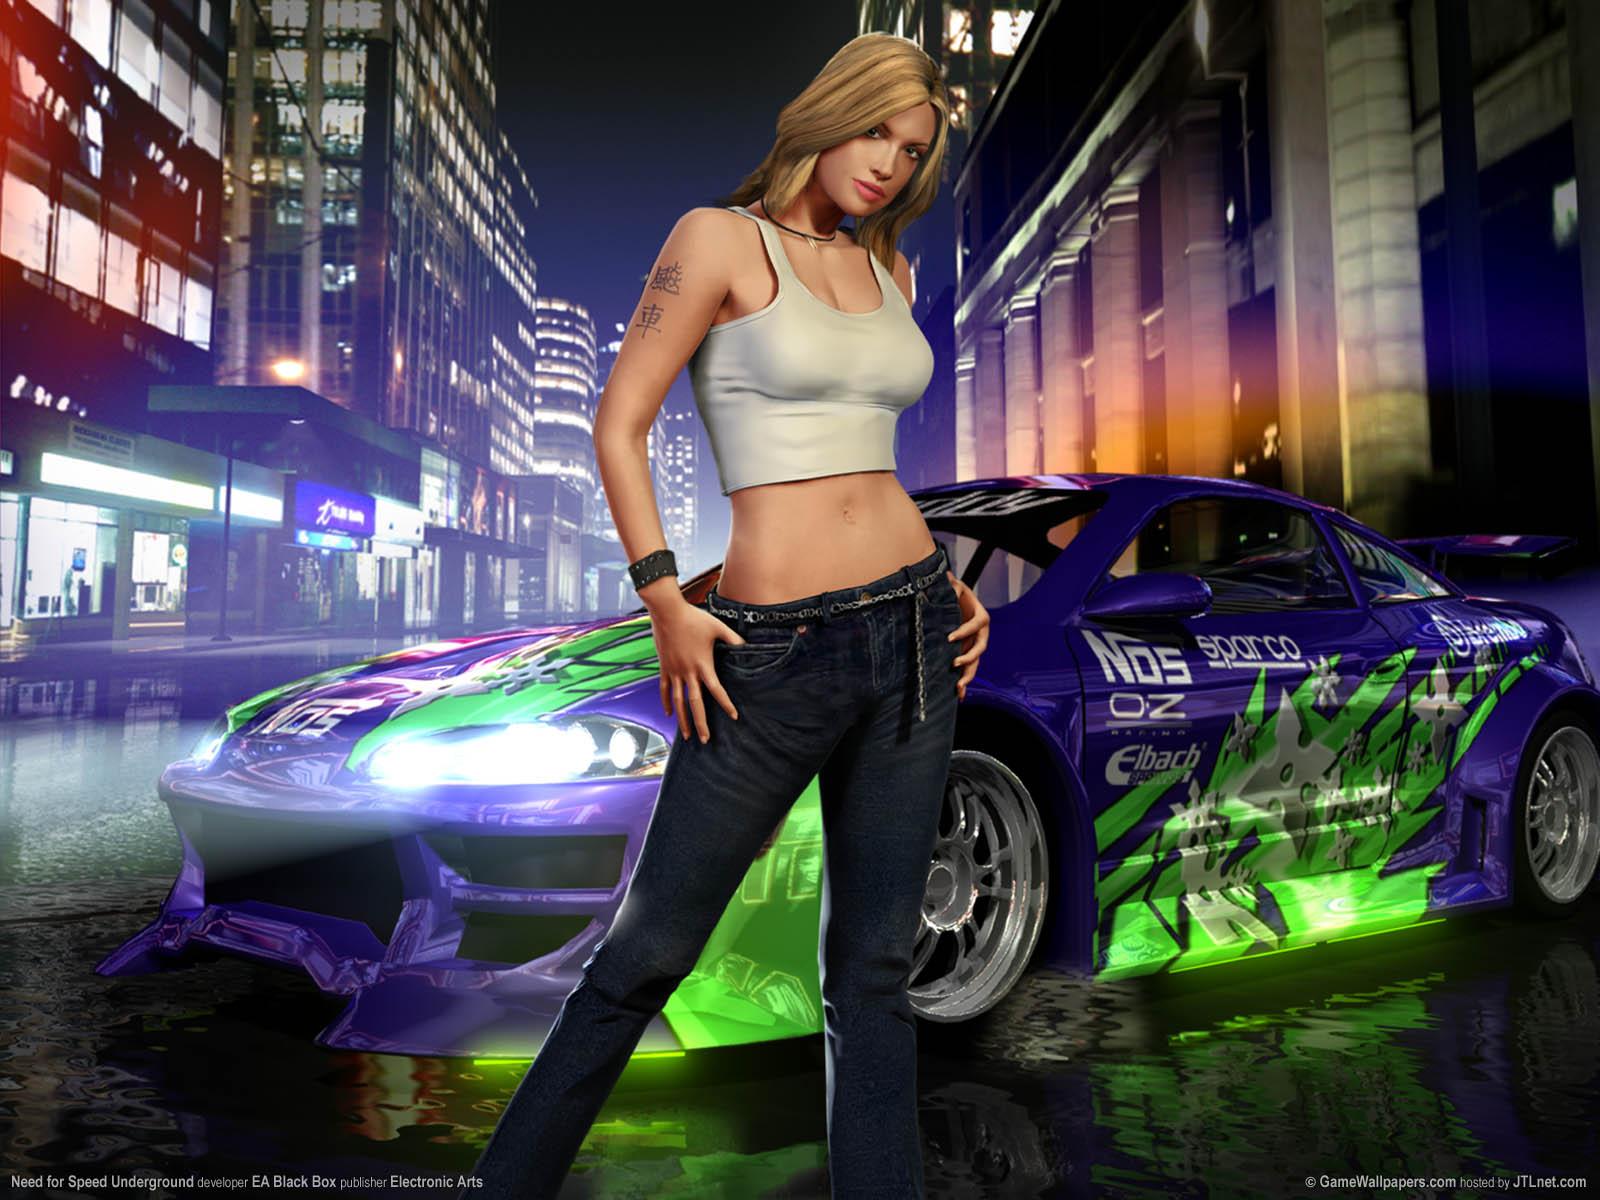 Need For Speed Underground Wallpaper 01 1600x1200